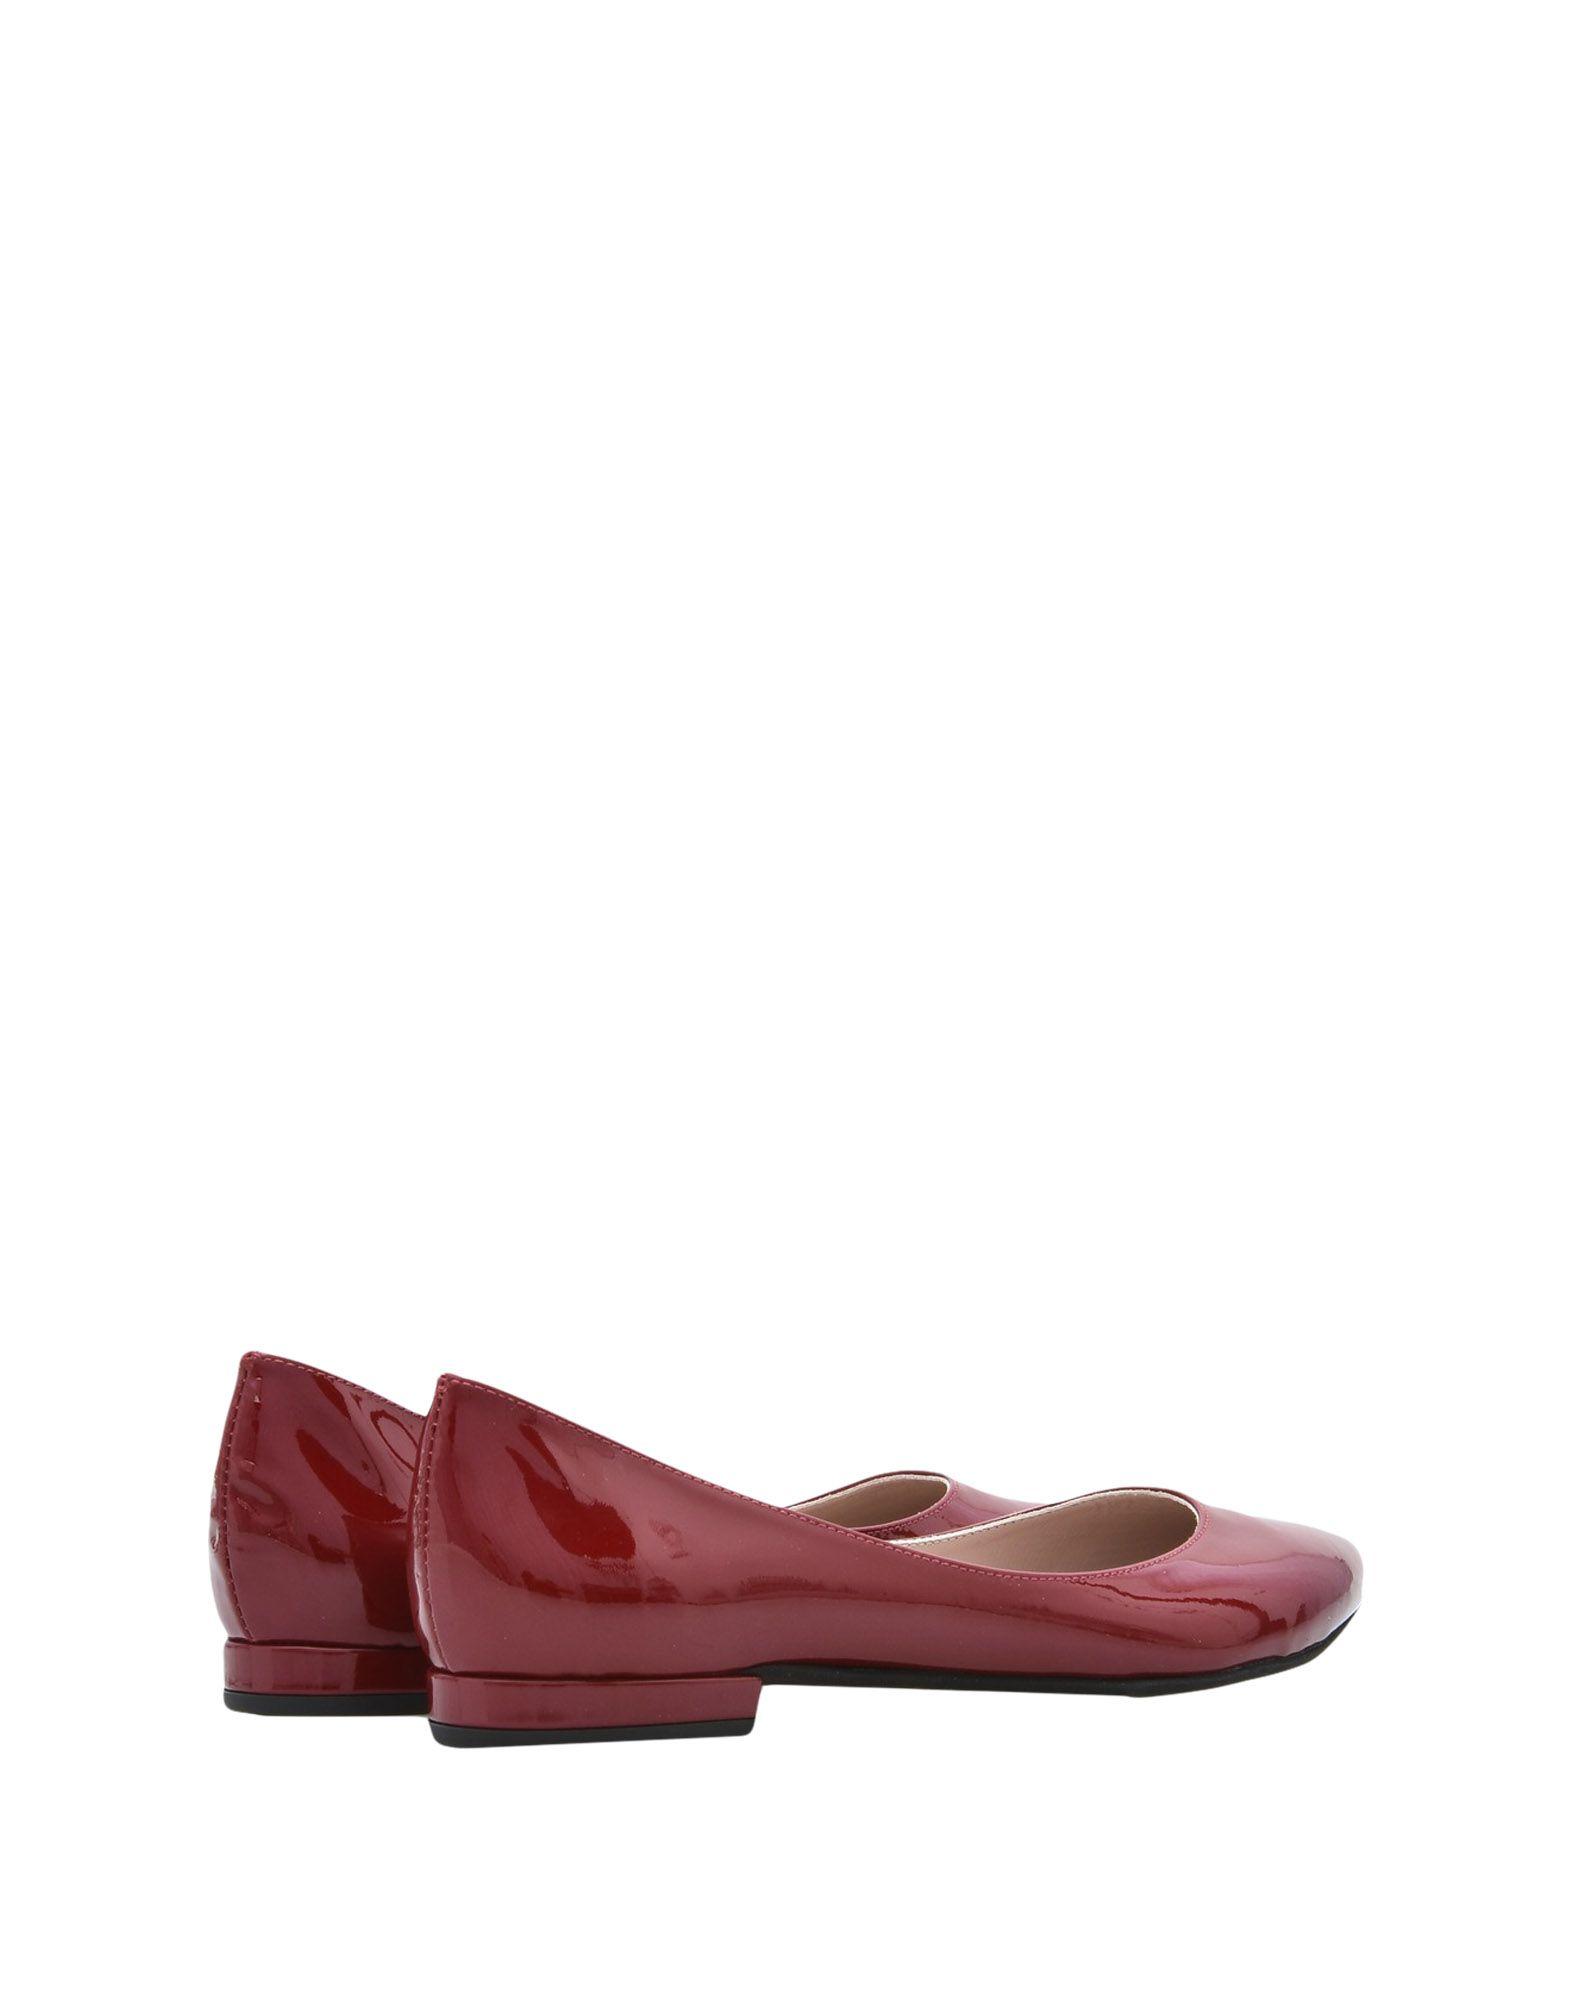 Stilvolle billige Schuhe Damen Savoy Ballerinas Damen Schuhe  11514453EF 7d646d